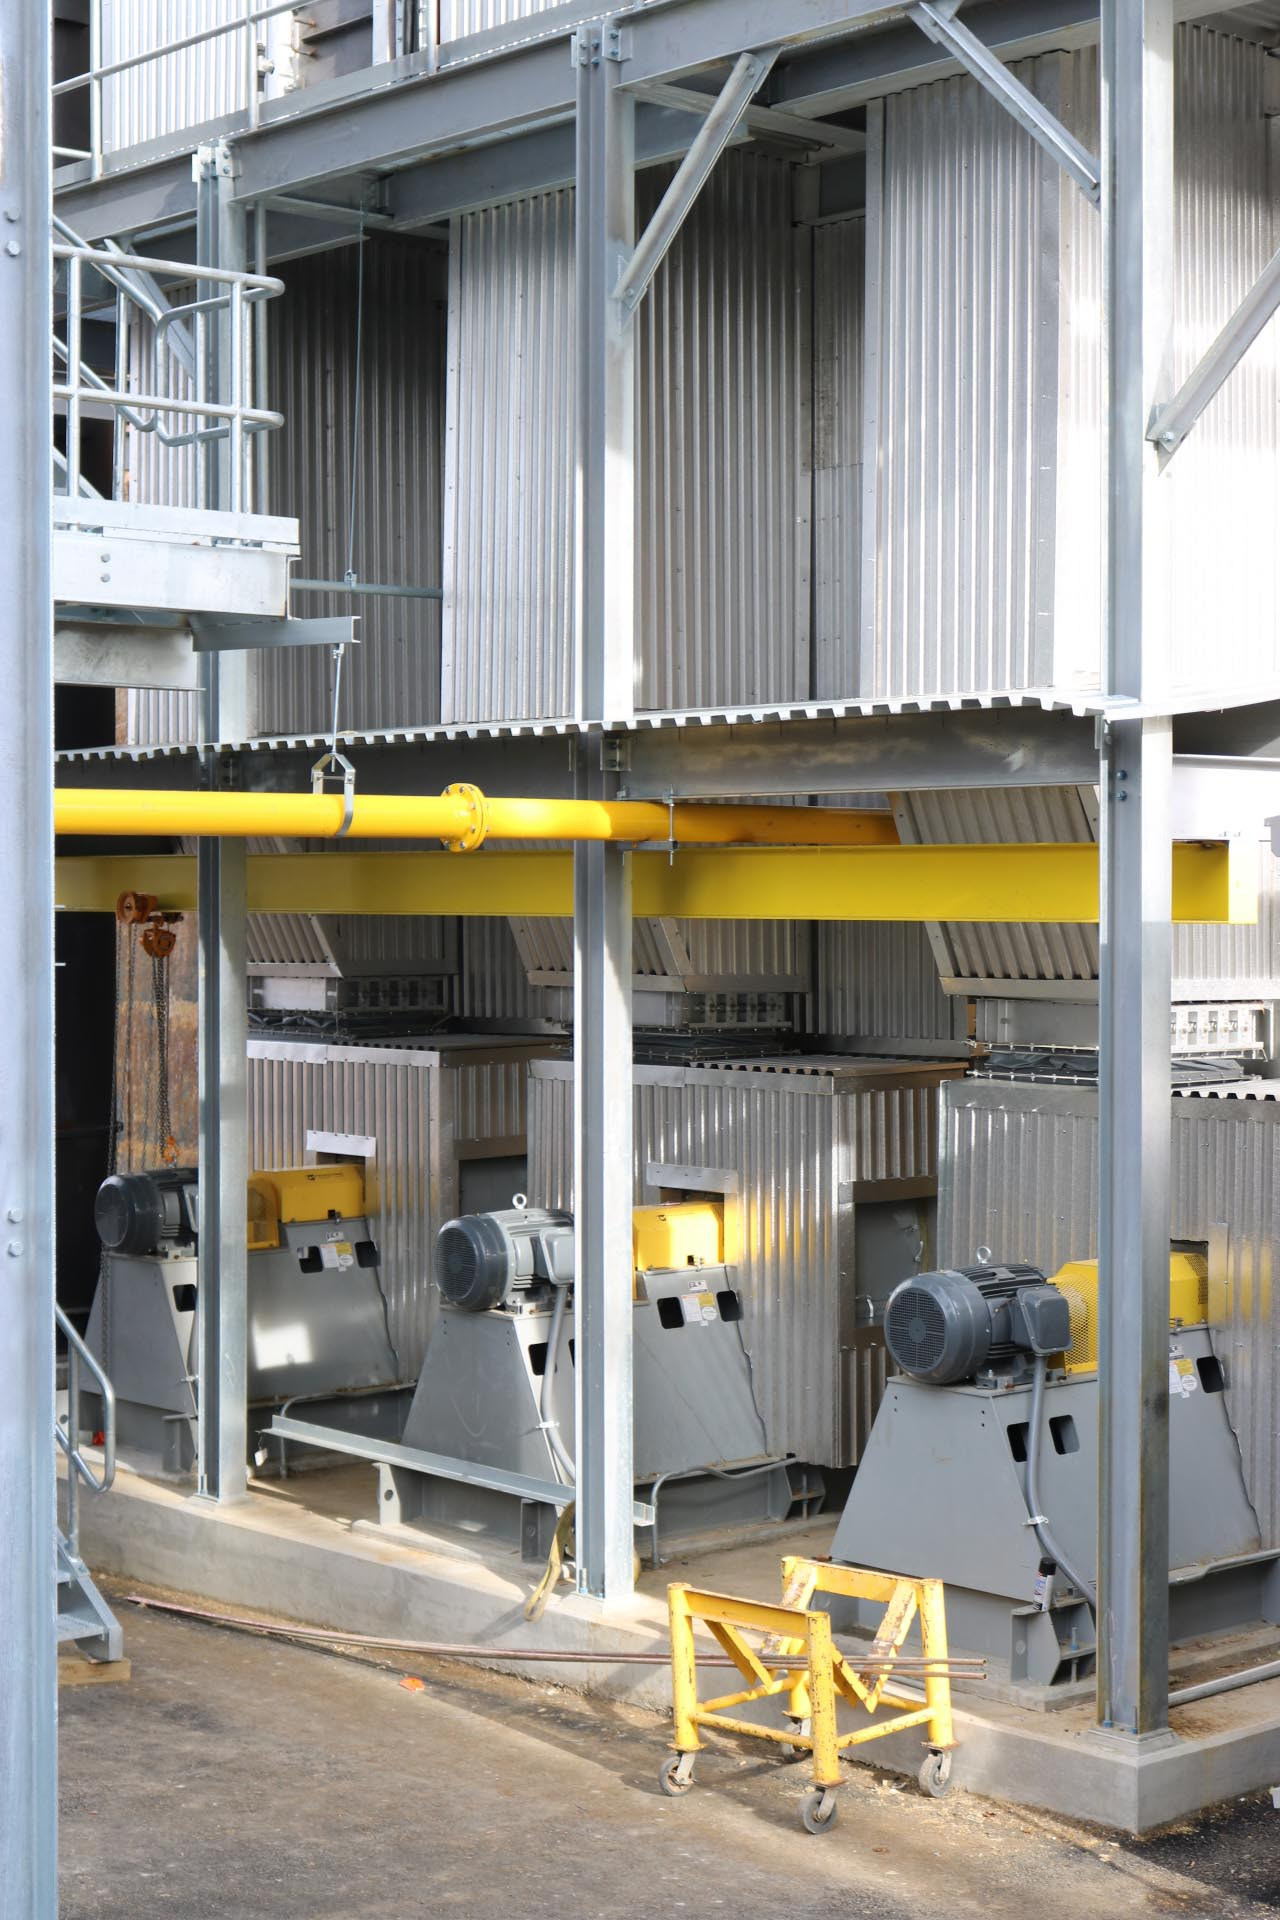 HRT - Exhaust for Boiler System 2